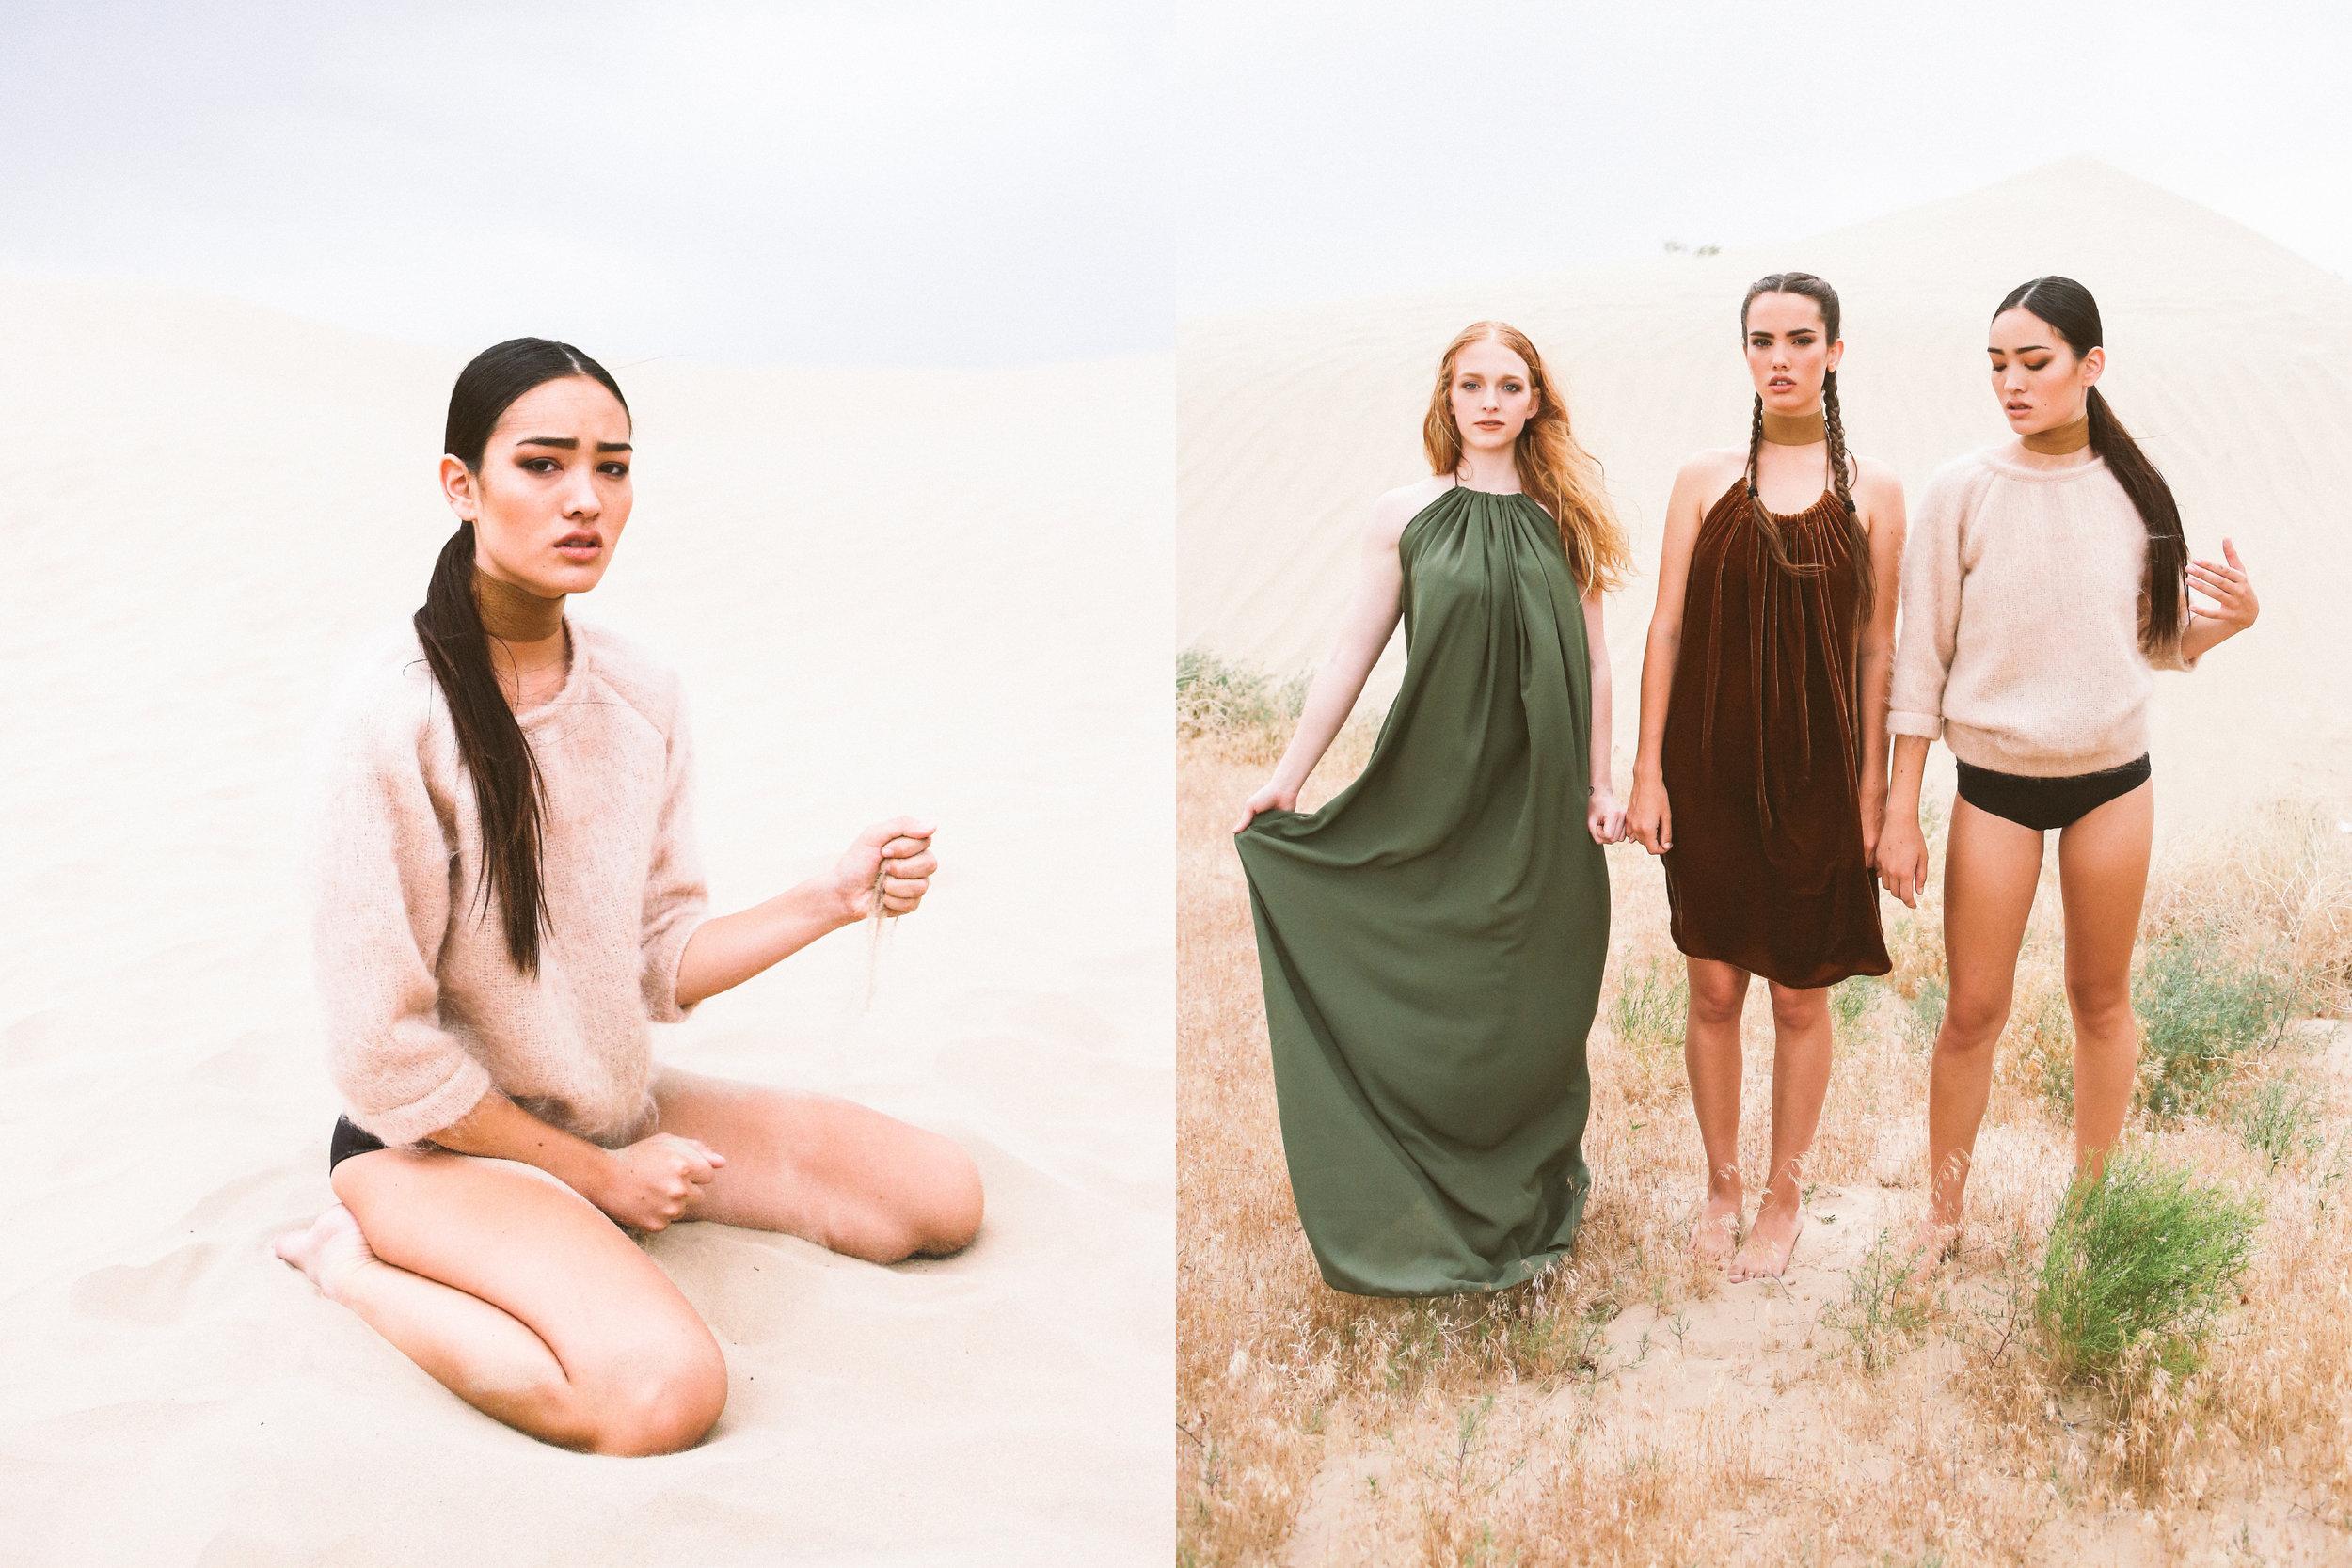 DETAILS  Photography: Evelyn Eslava  Makeup: Chelsea Vuksinick  Wardrobe: Melody Noy  Models (left to right): Elizabeth Wood , Tiffany Pliler ,Camille Nicole Styling by: Megan Beckham